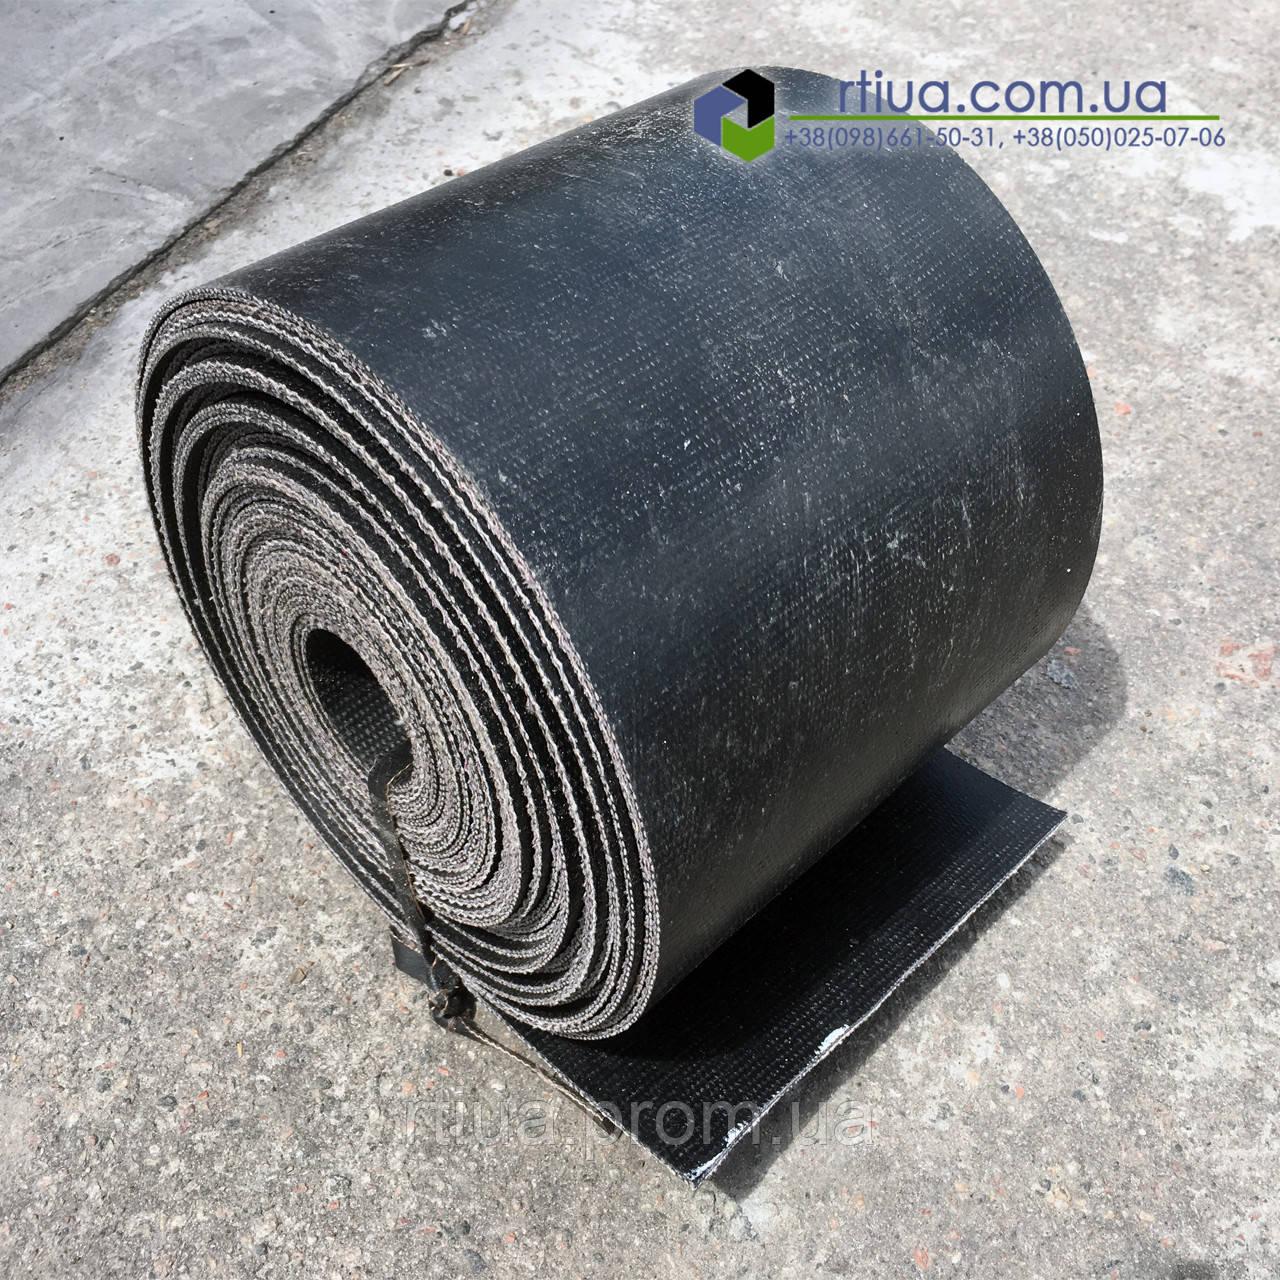 Транспортерная лента ТК-200, 800х5 - 5/2 (12 мм)